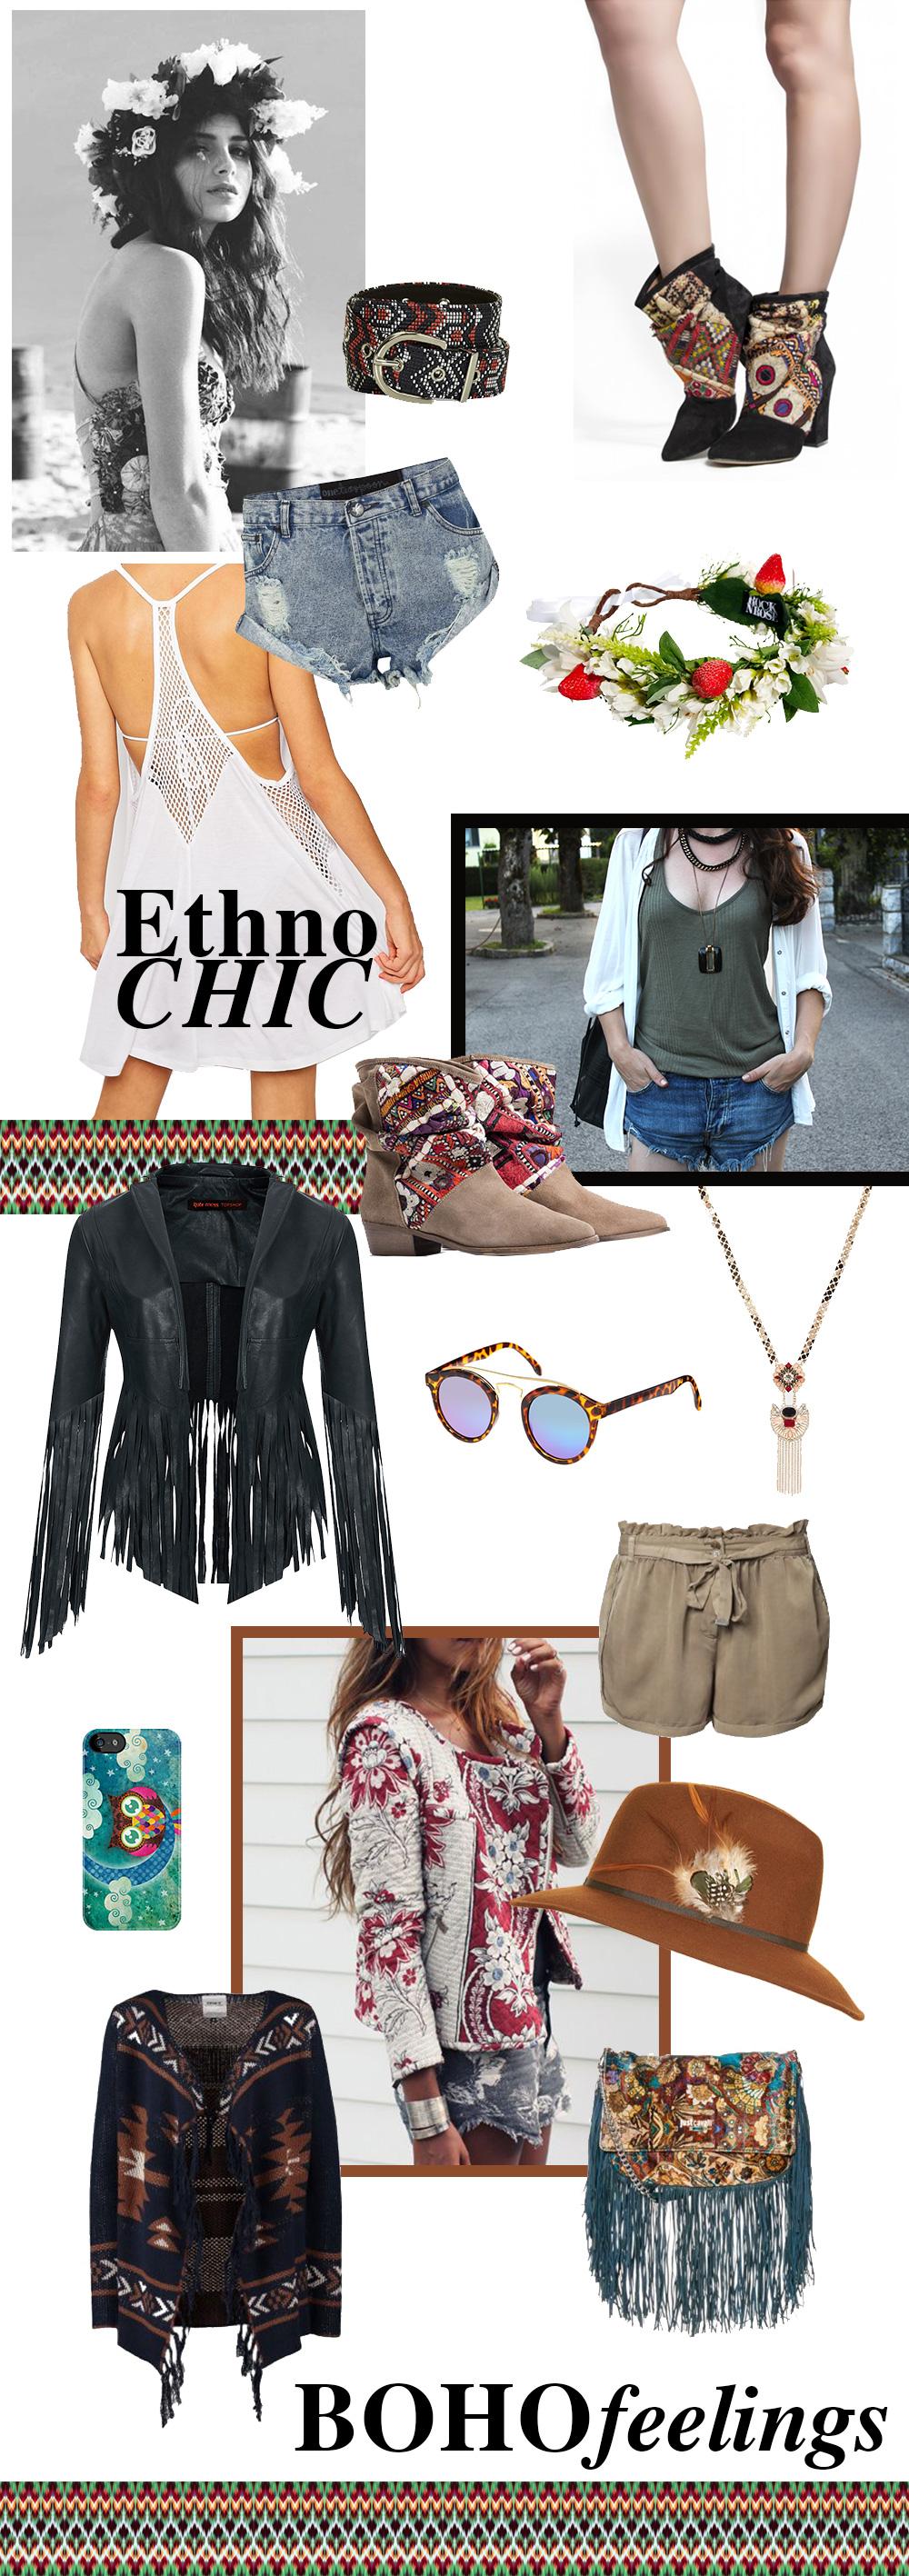 whoismocca, fashionblog tirol, fashionblog Österreich, boho ethno festival bohemian hippie style chic, inspiration